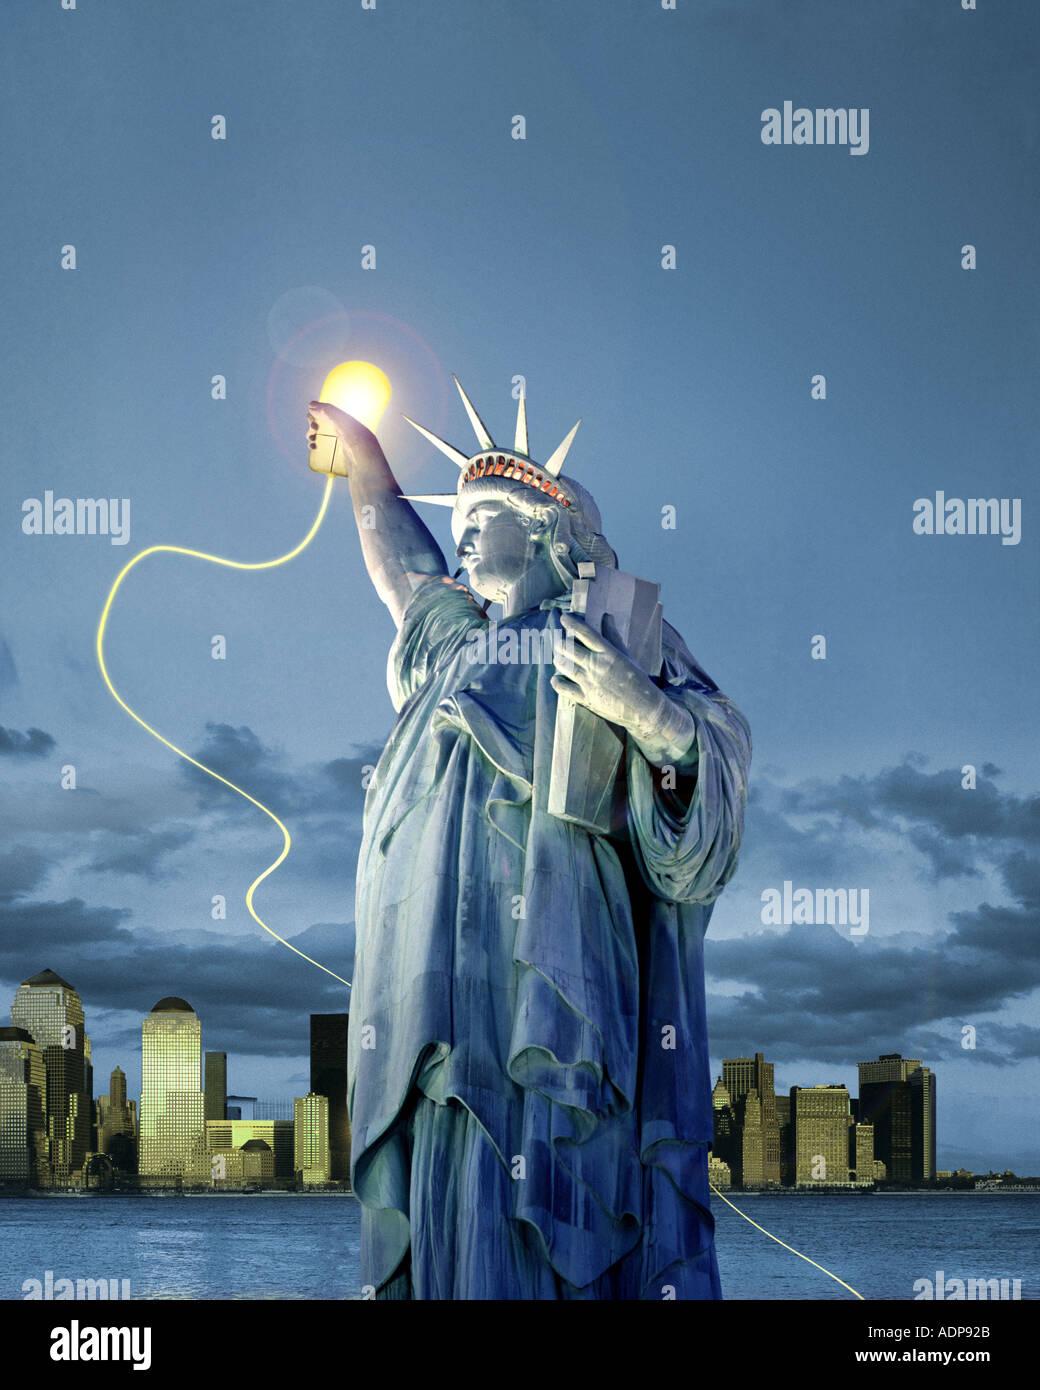 USA - NEW YORK: Liberty Online - Stock Image